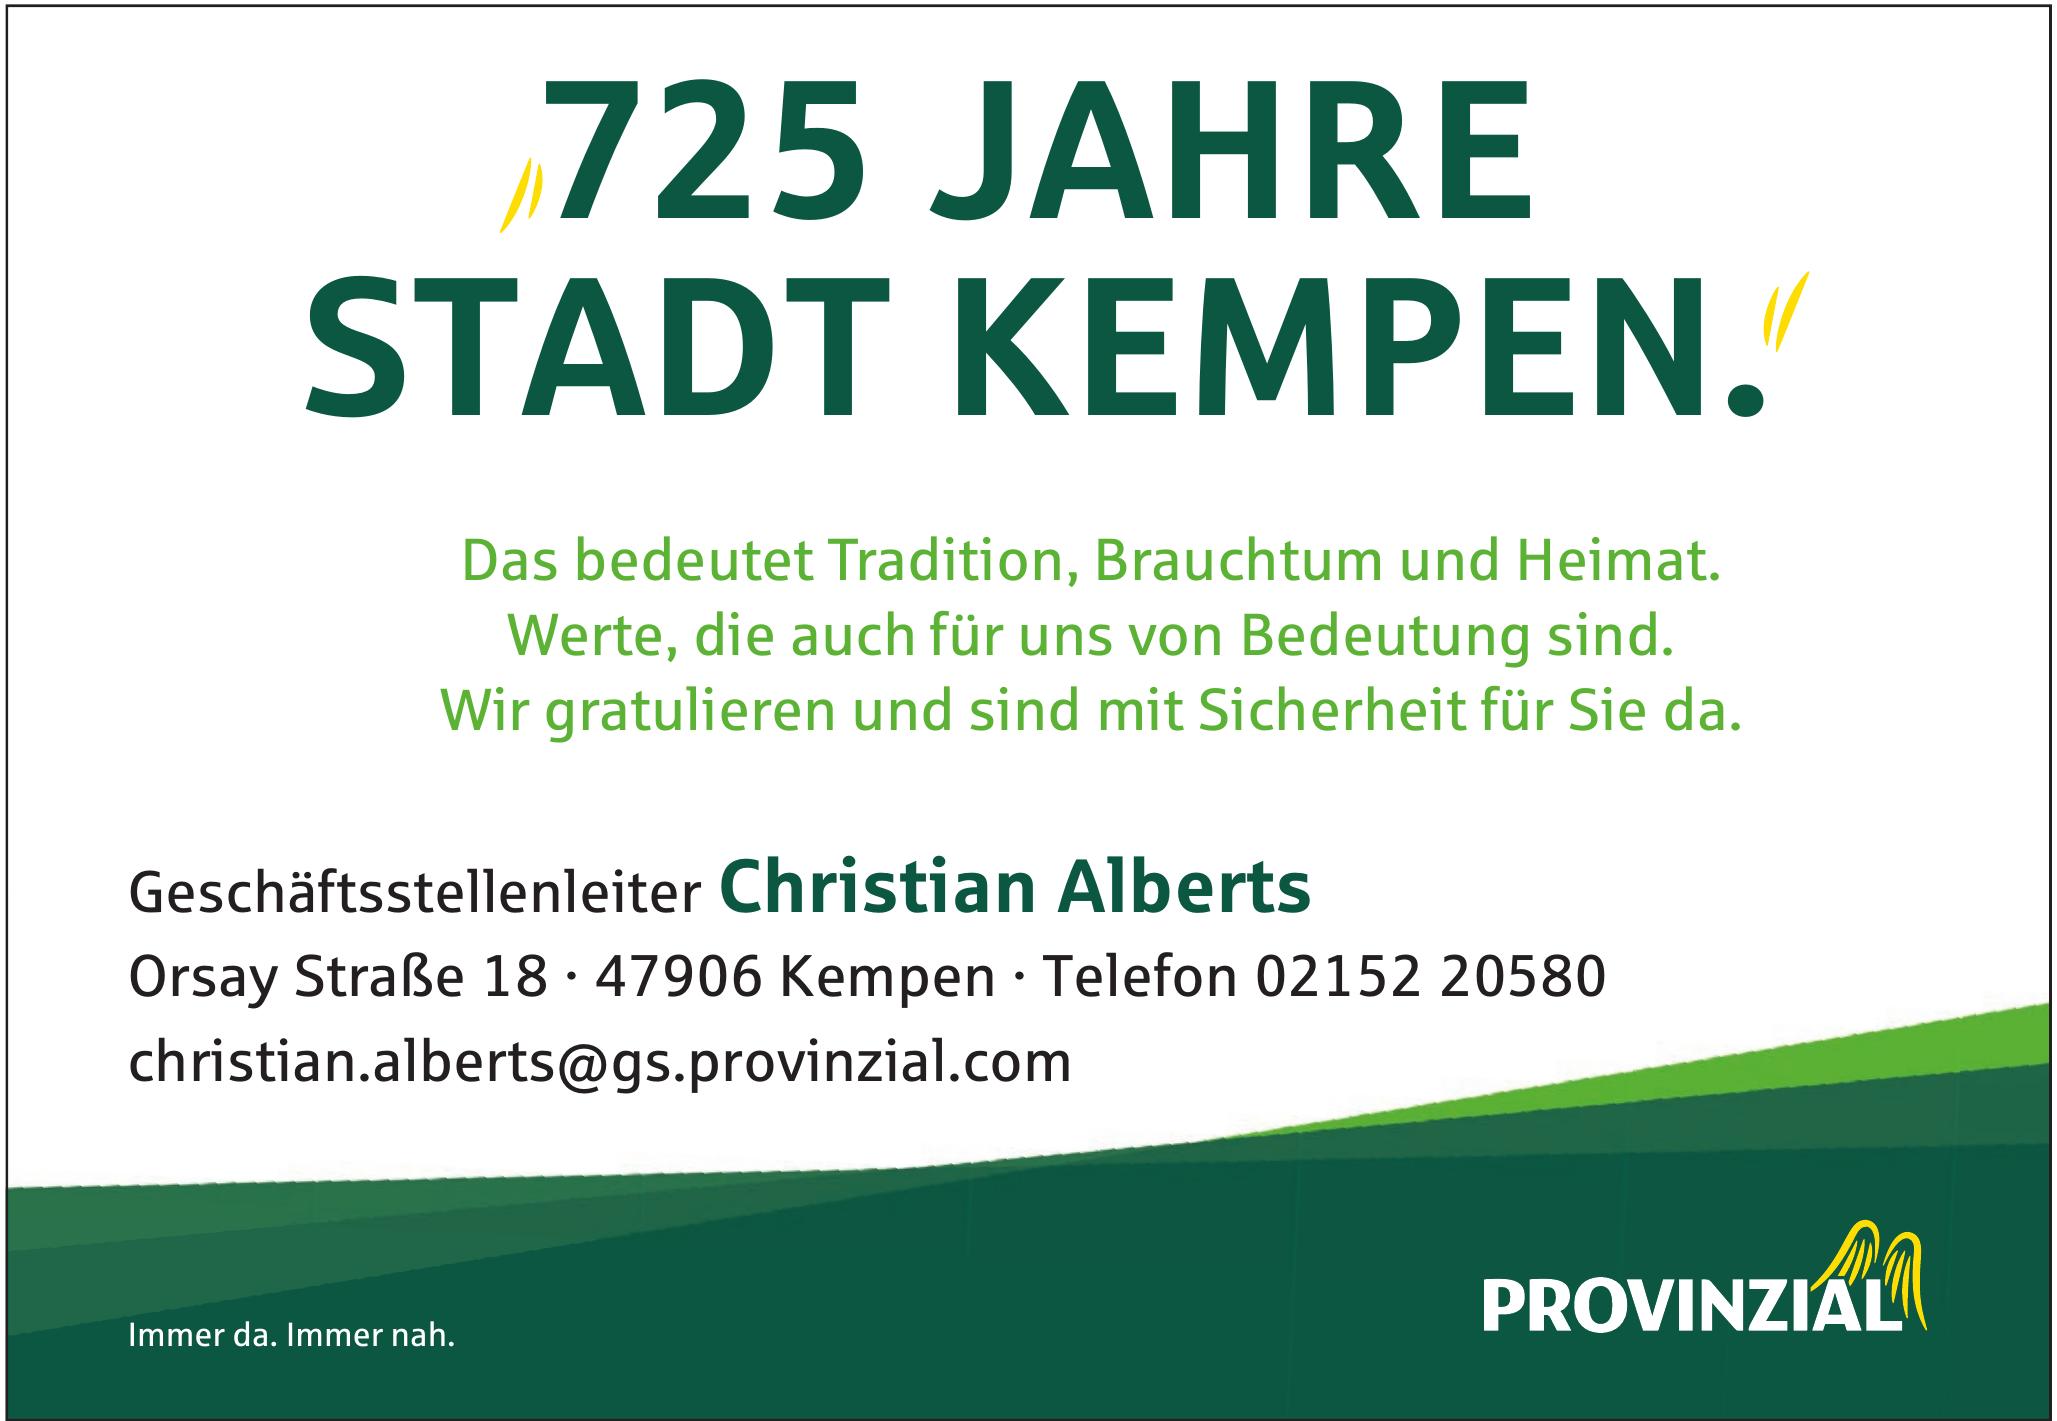 Provinzial Christian Alberts